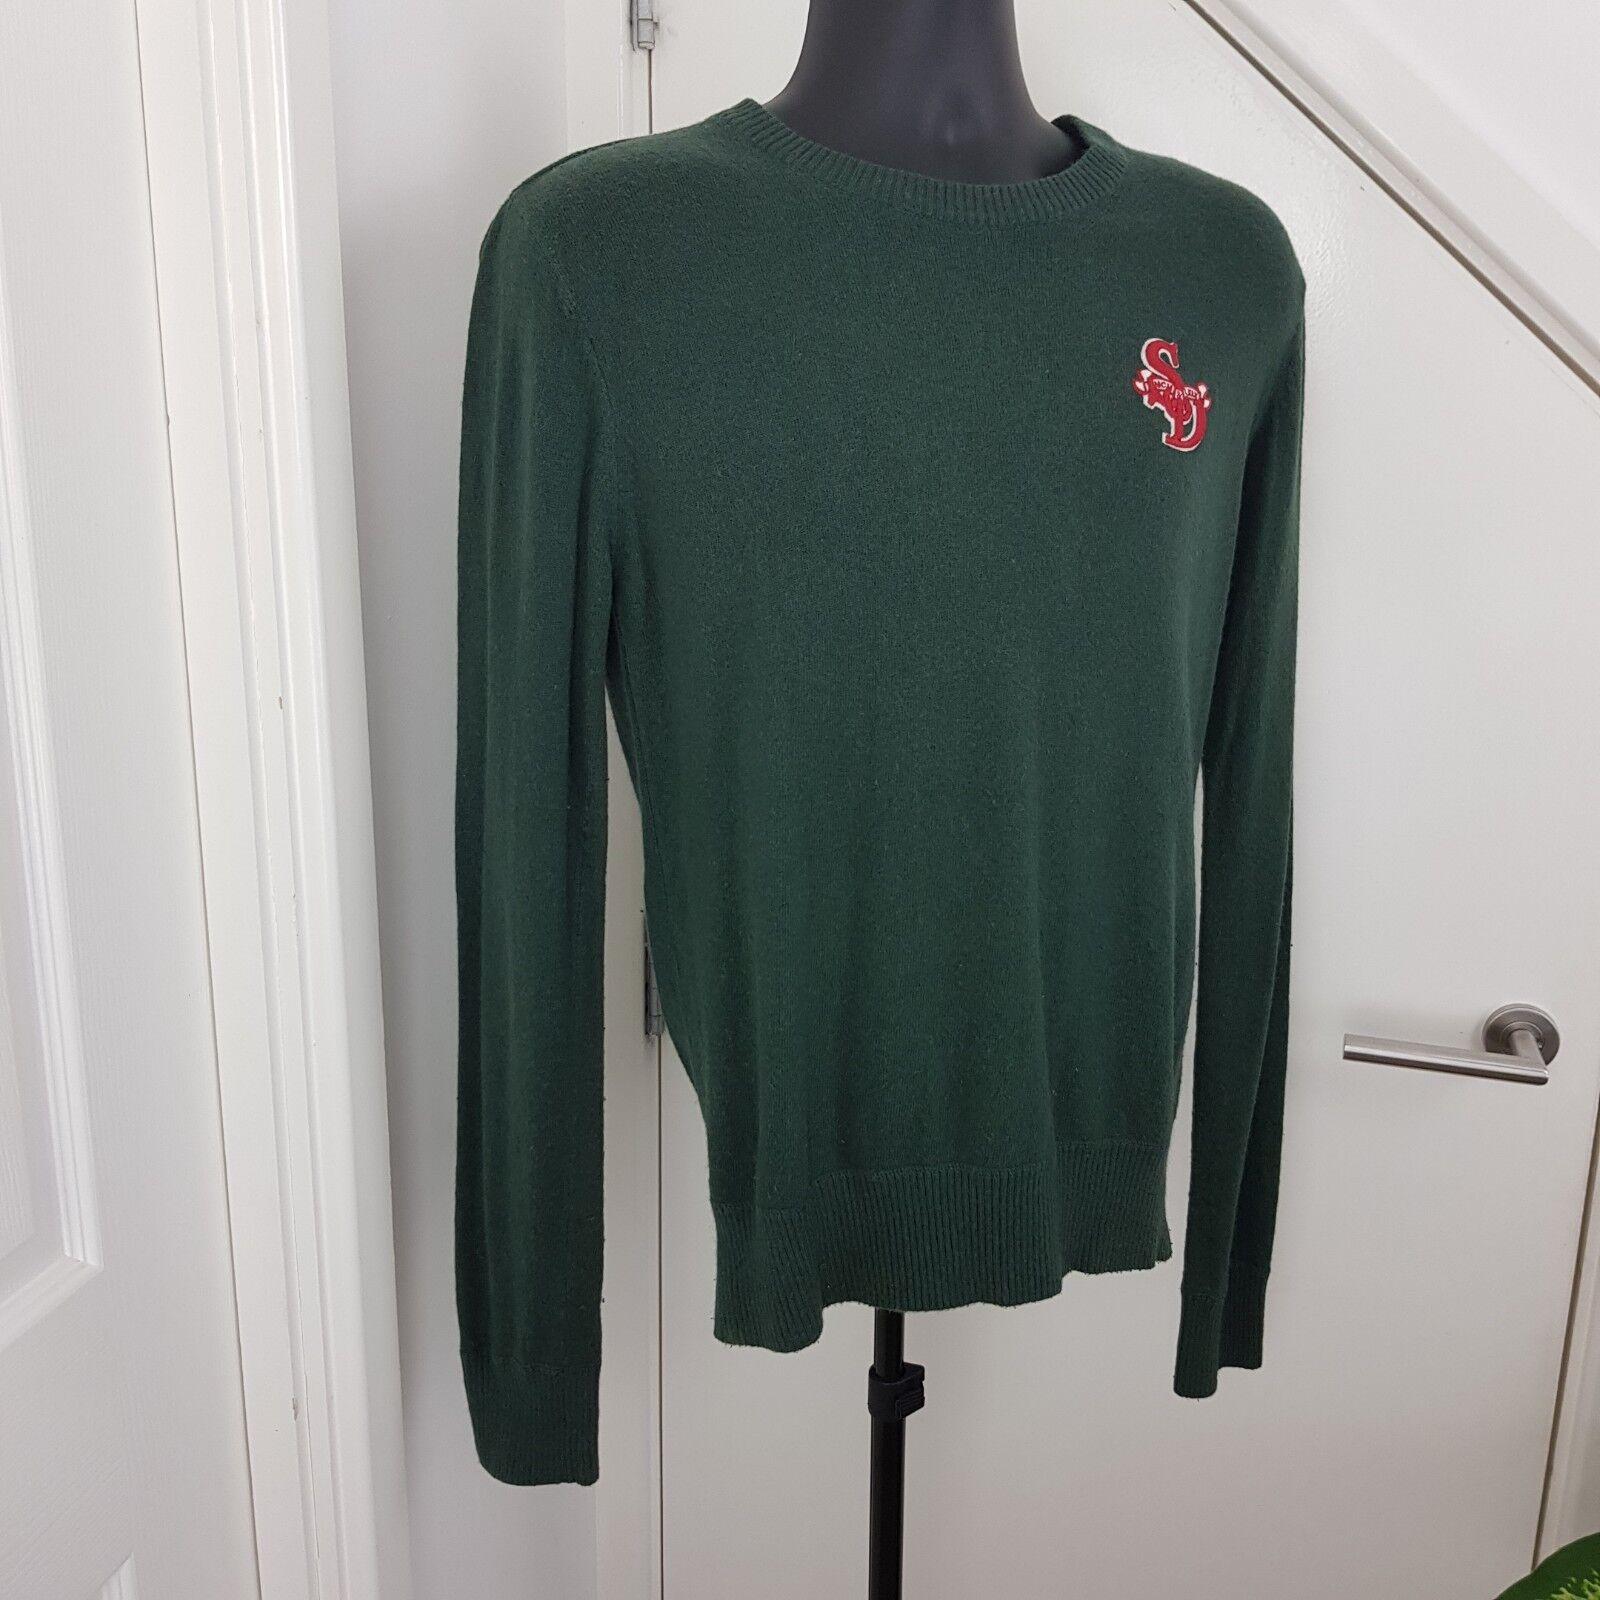 Superdry Jumper Uomo Angora Cotton Cotton Cotton Crew Neck Long Sleeves Cardigan verde Dimensione S 2165da